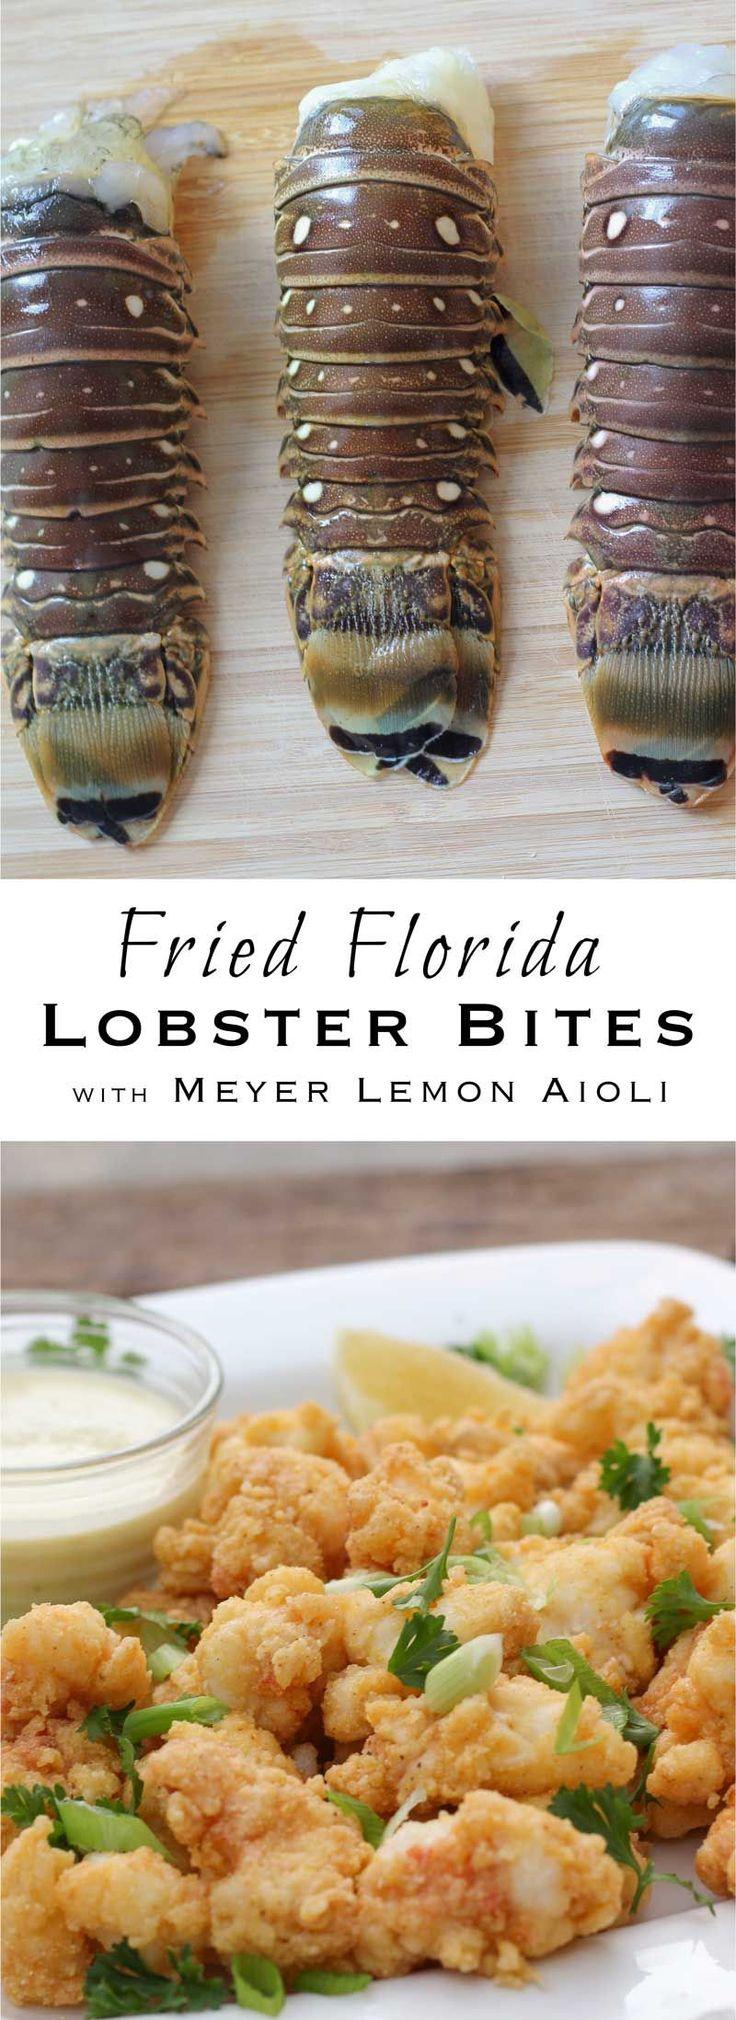 Fried Florida Lobster Bites with Meyer Lemon Aioli (Lemon Bake Cod)